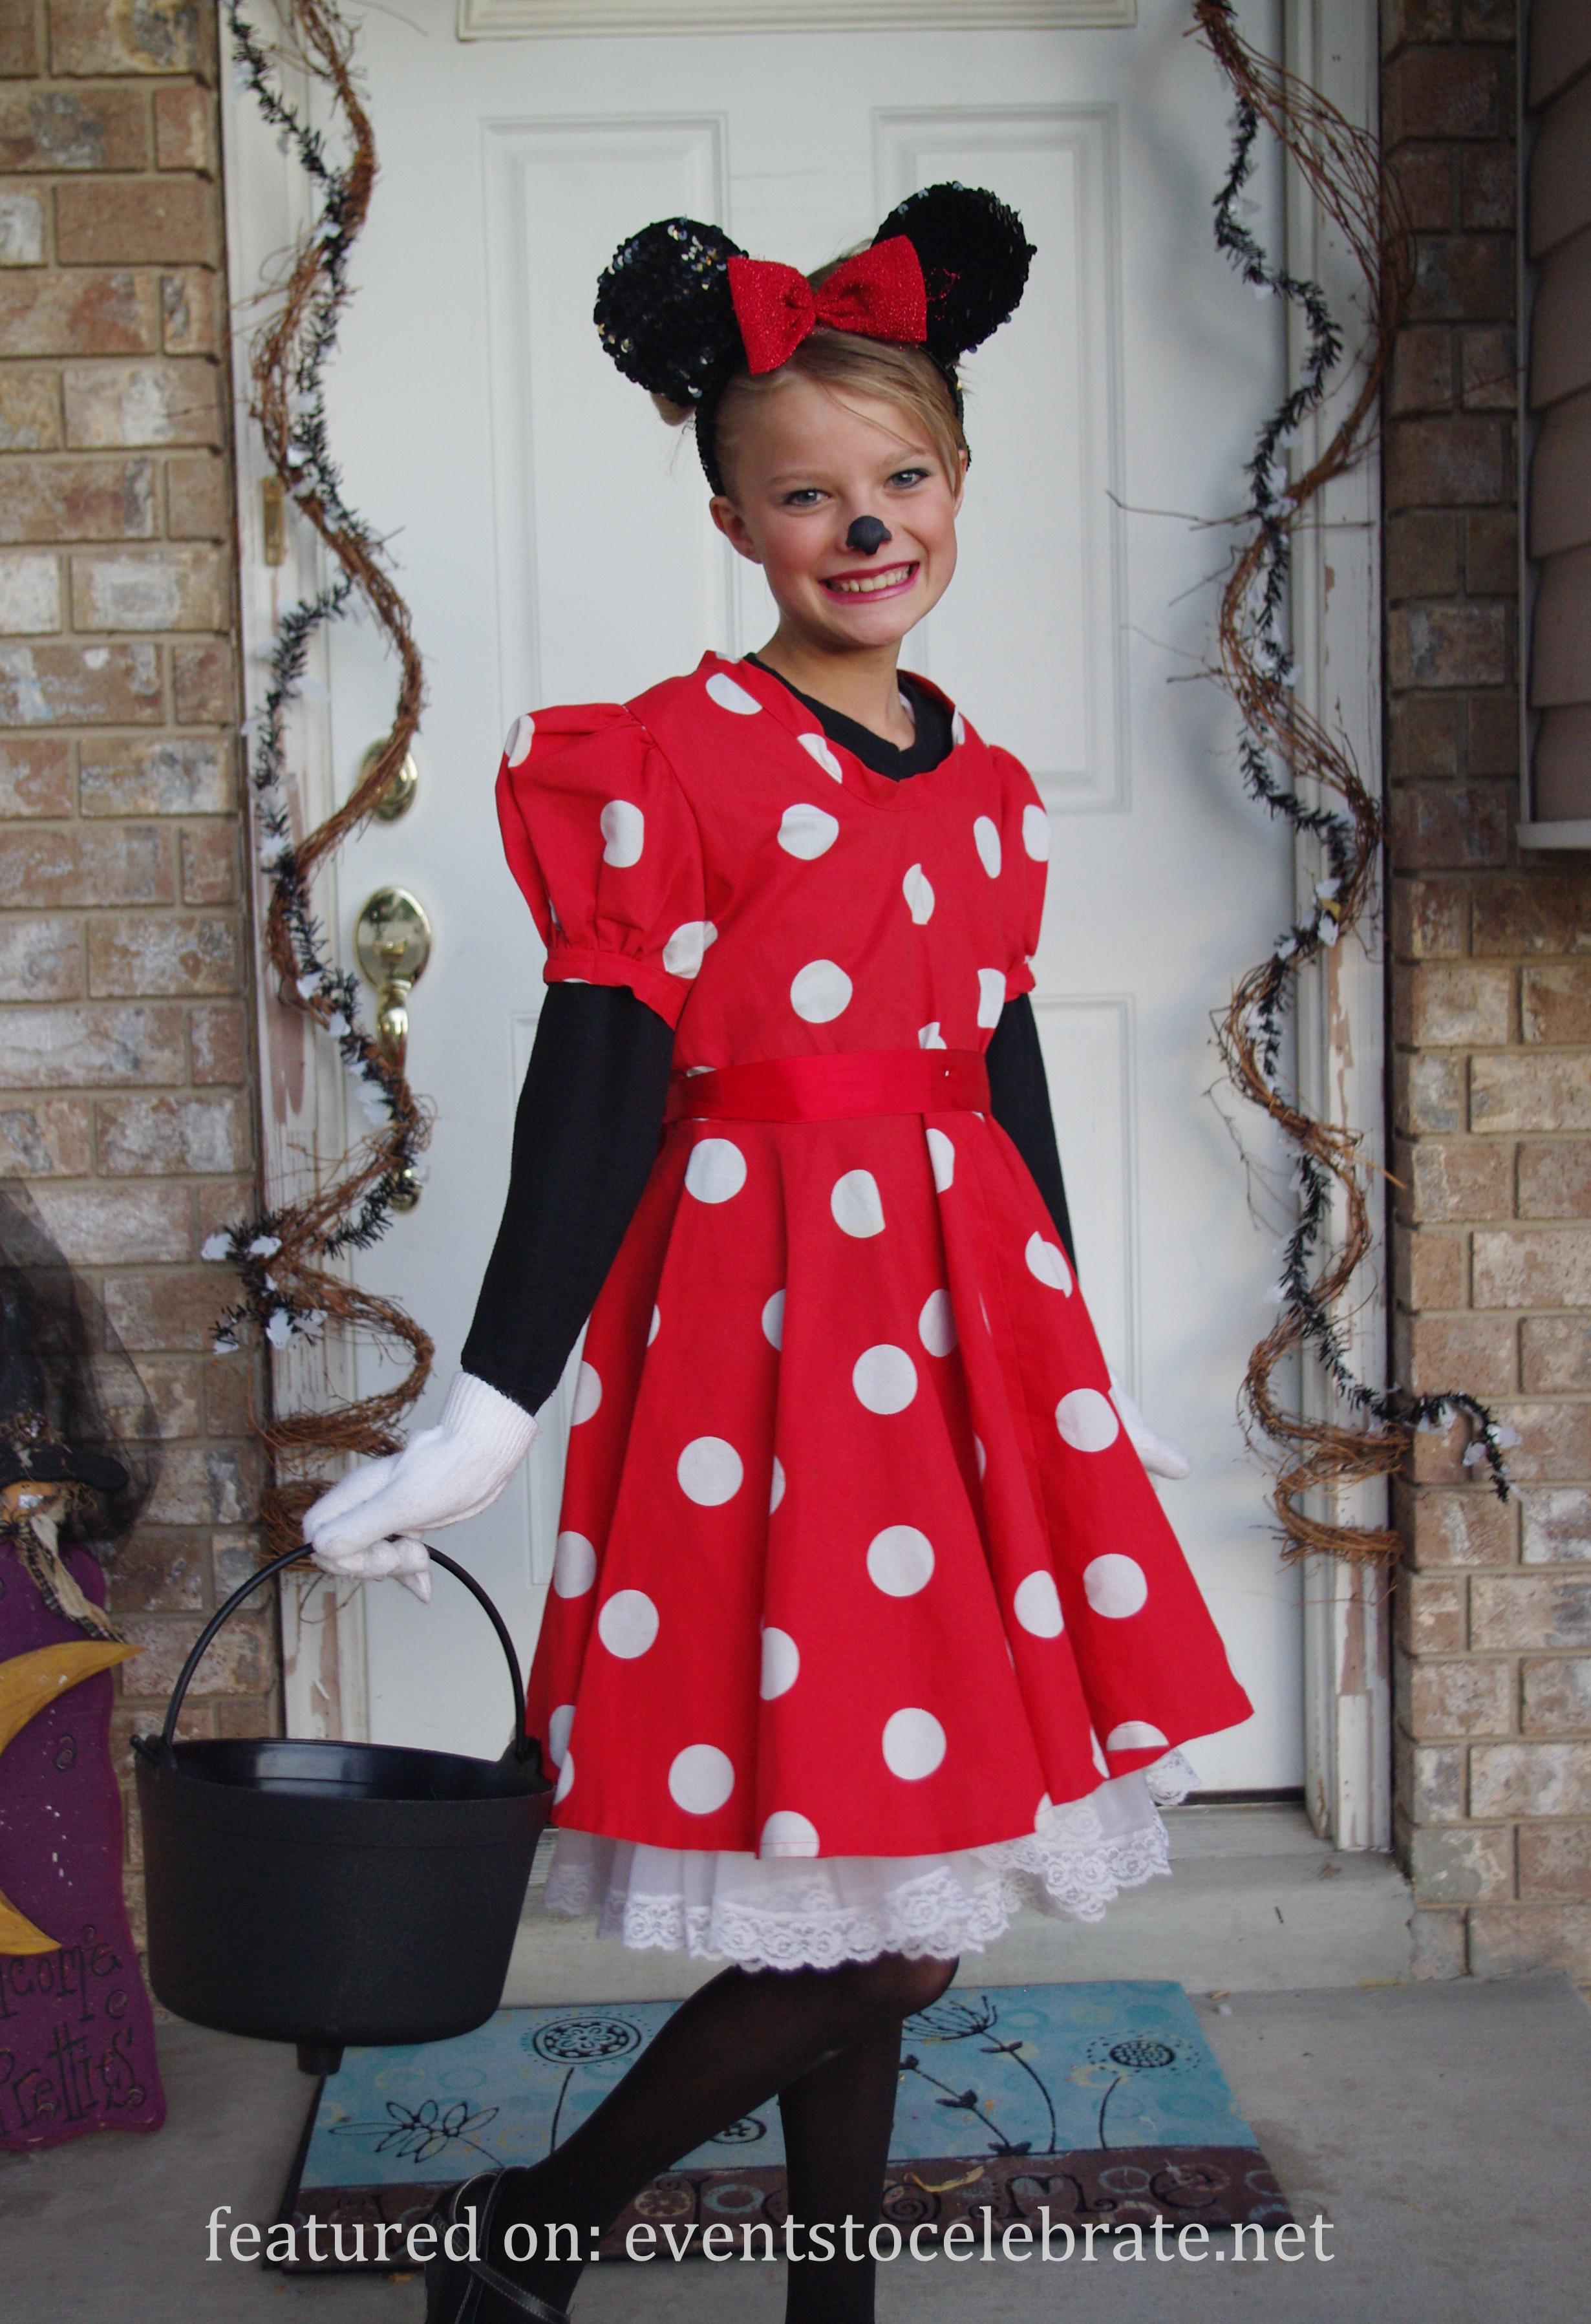 diy halloween costumes events to celebrate. Black Bedroom Furniture Sets. Home Design Ideas